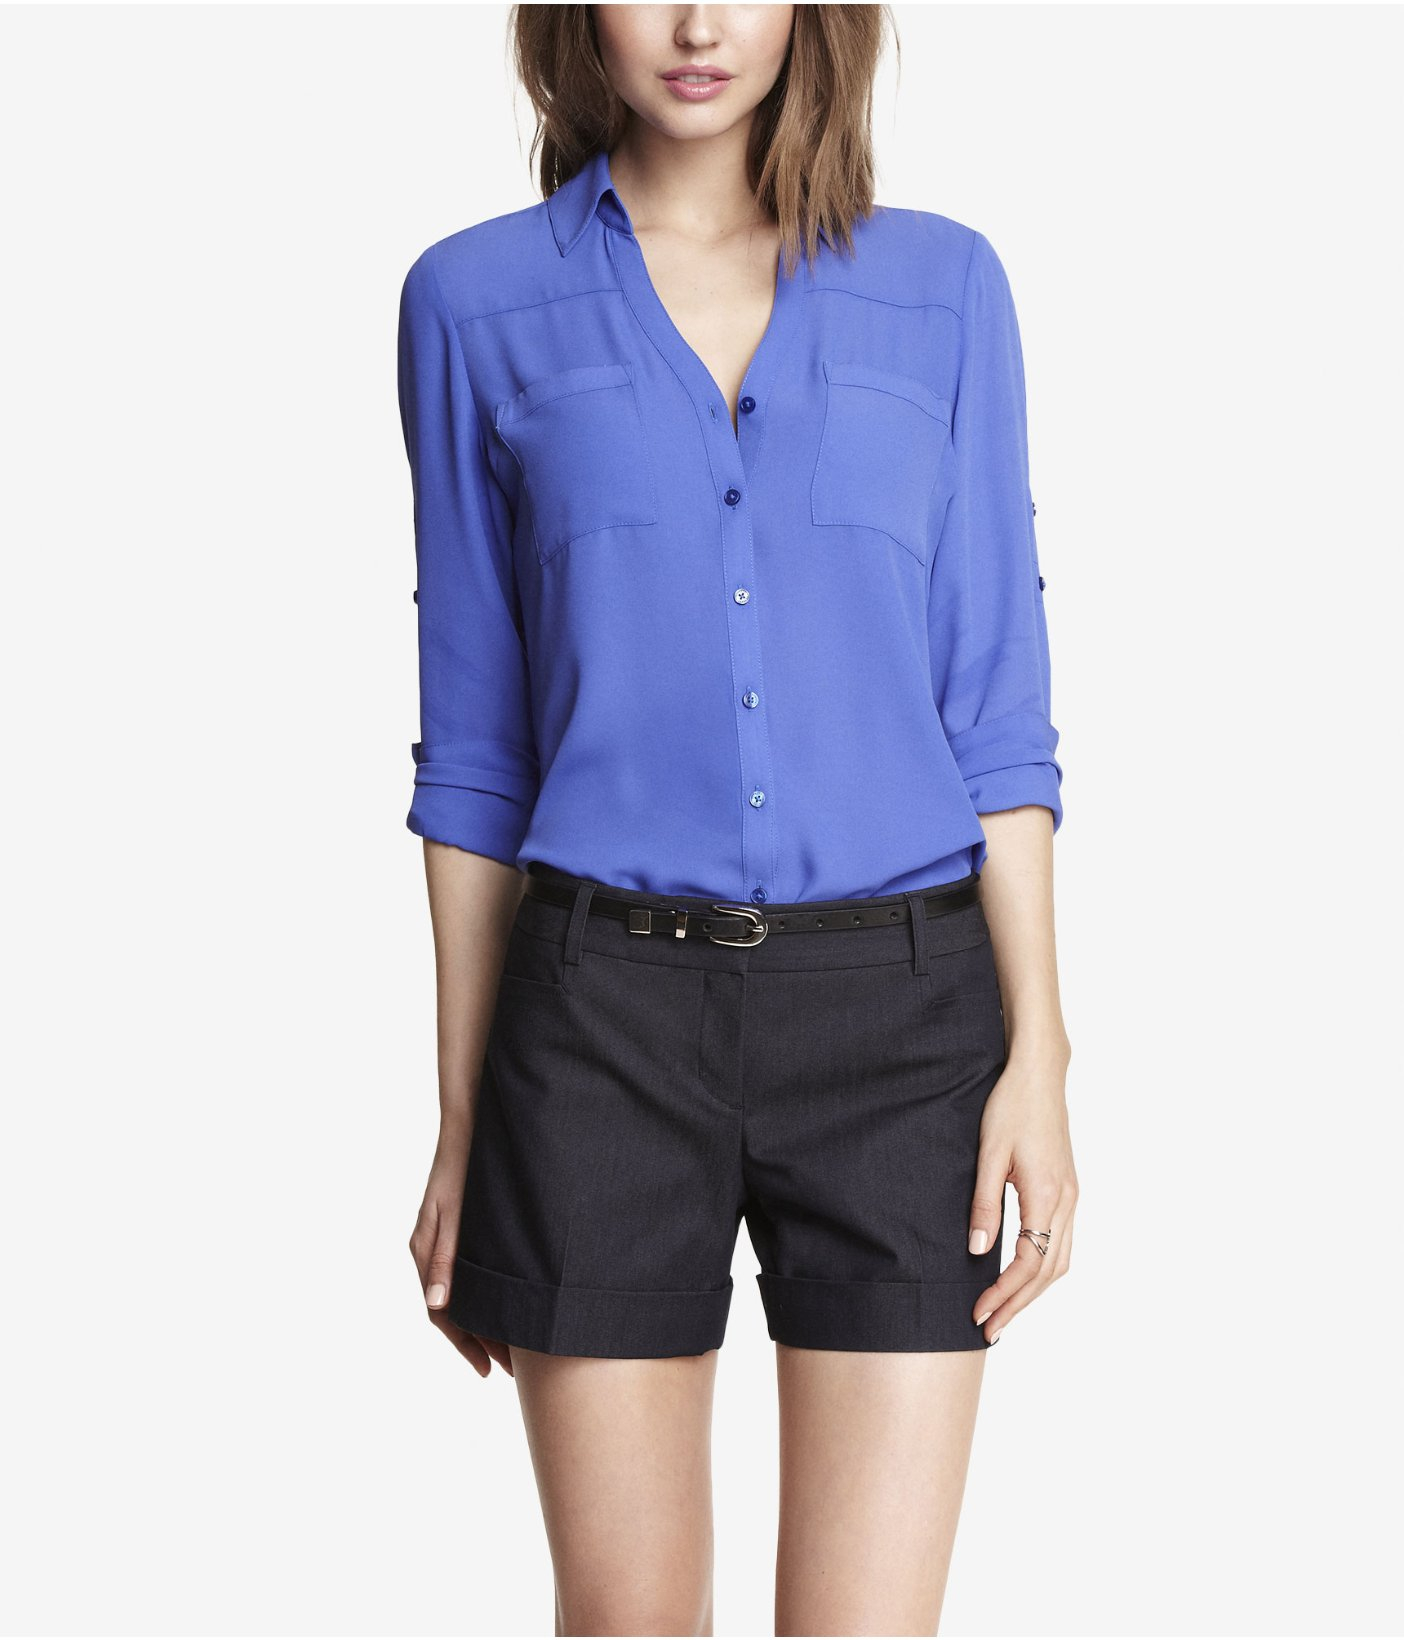 947d5d5f29b9 ... express the convertible sleeve portofino shirt in purple lyst ...